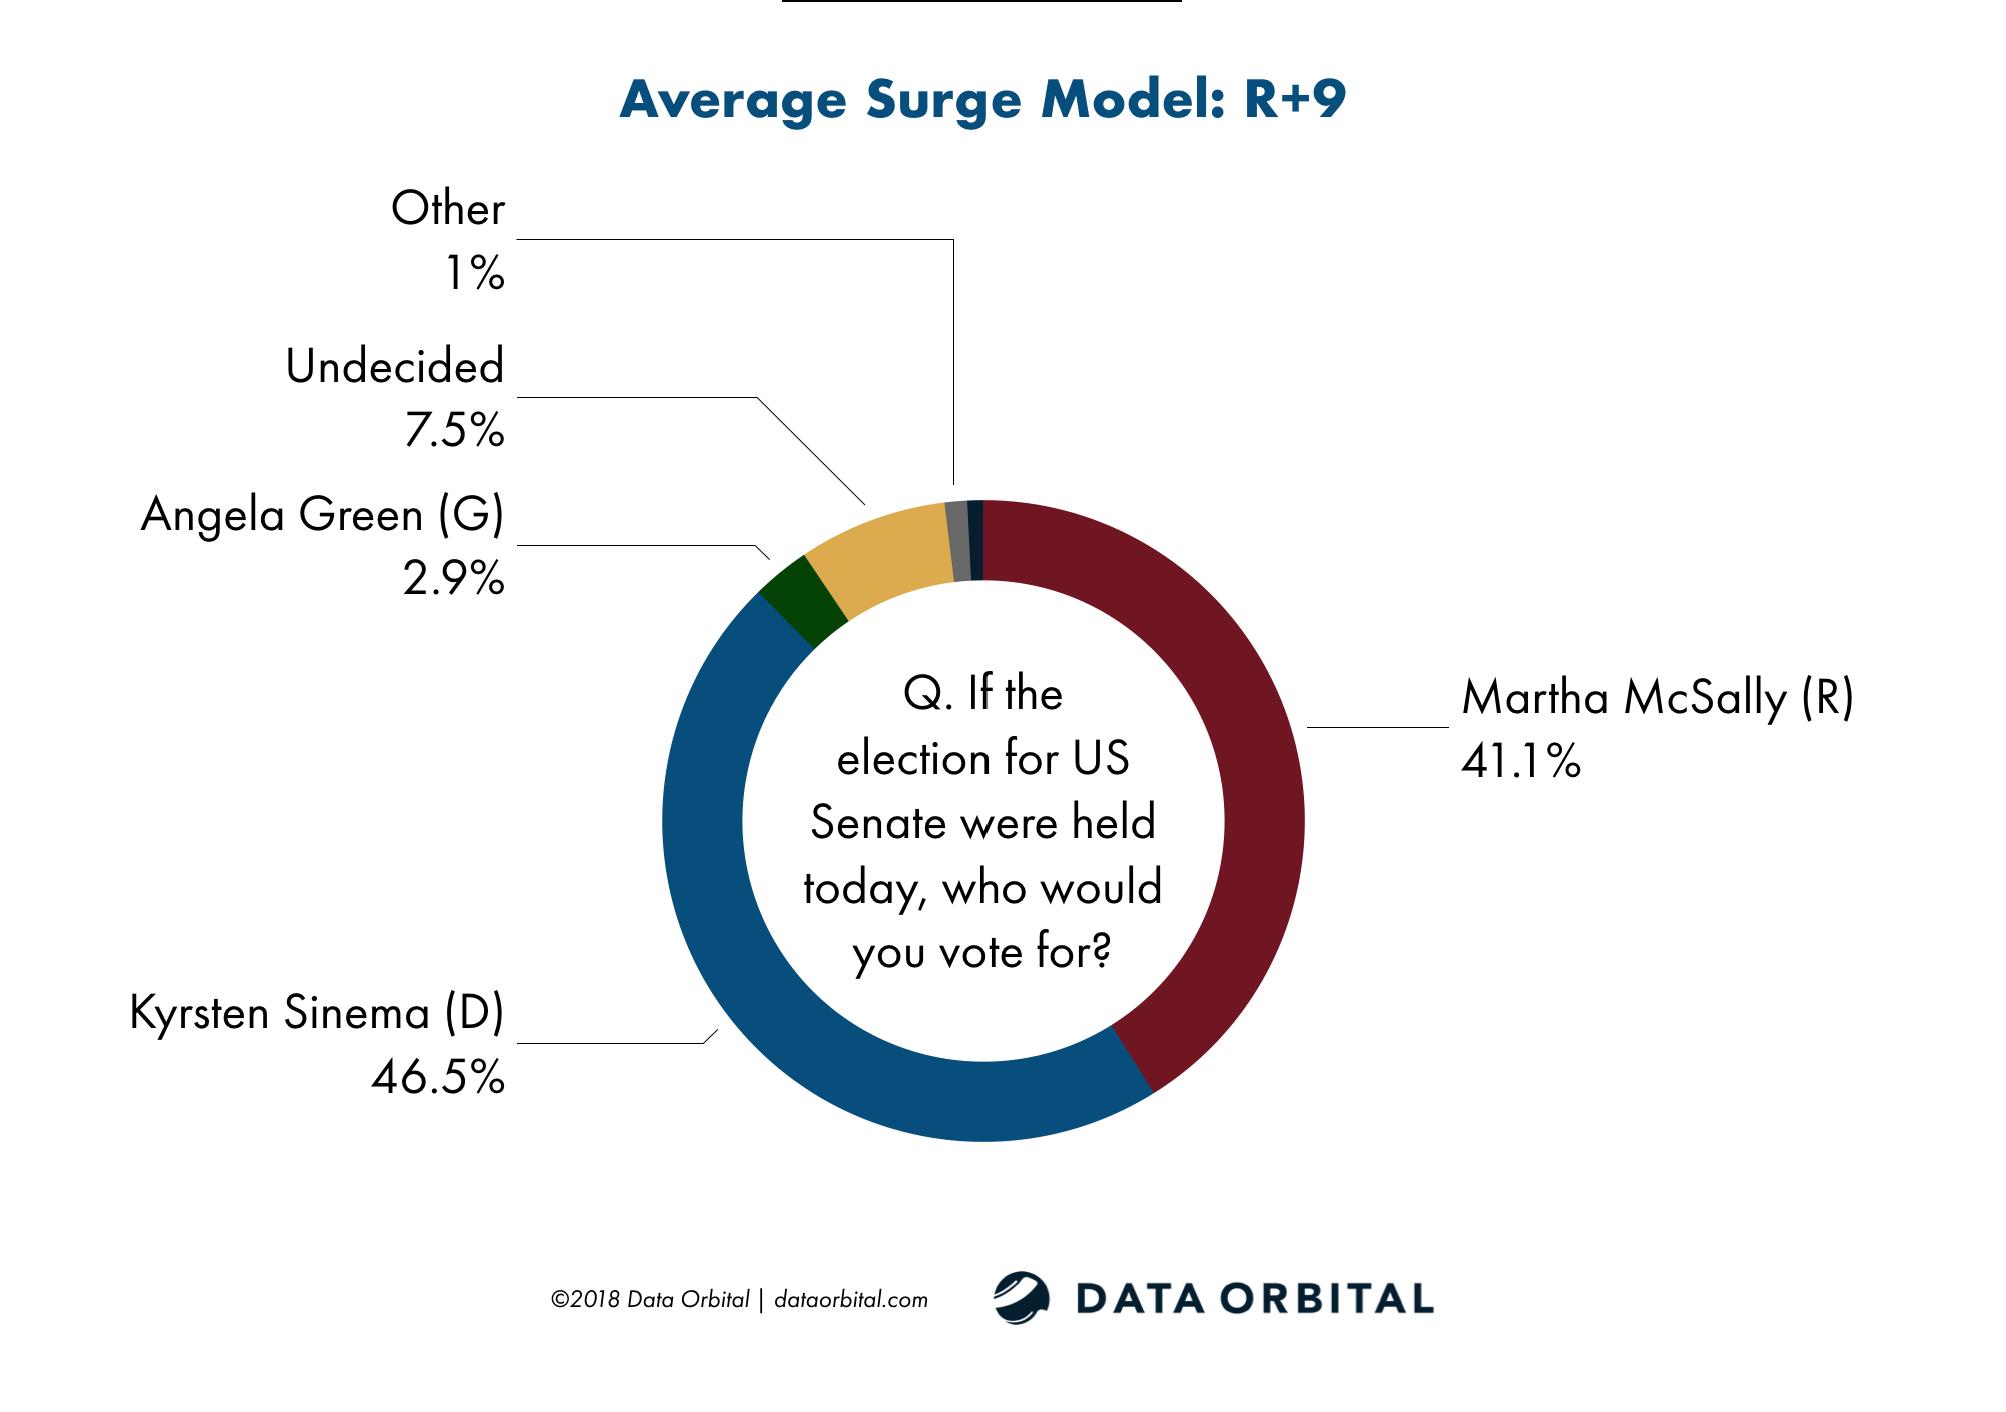 Data Orbital Average Surge Model US Senate Survey October 2018